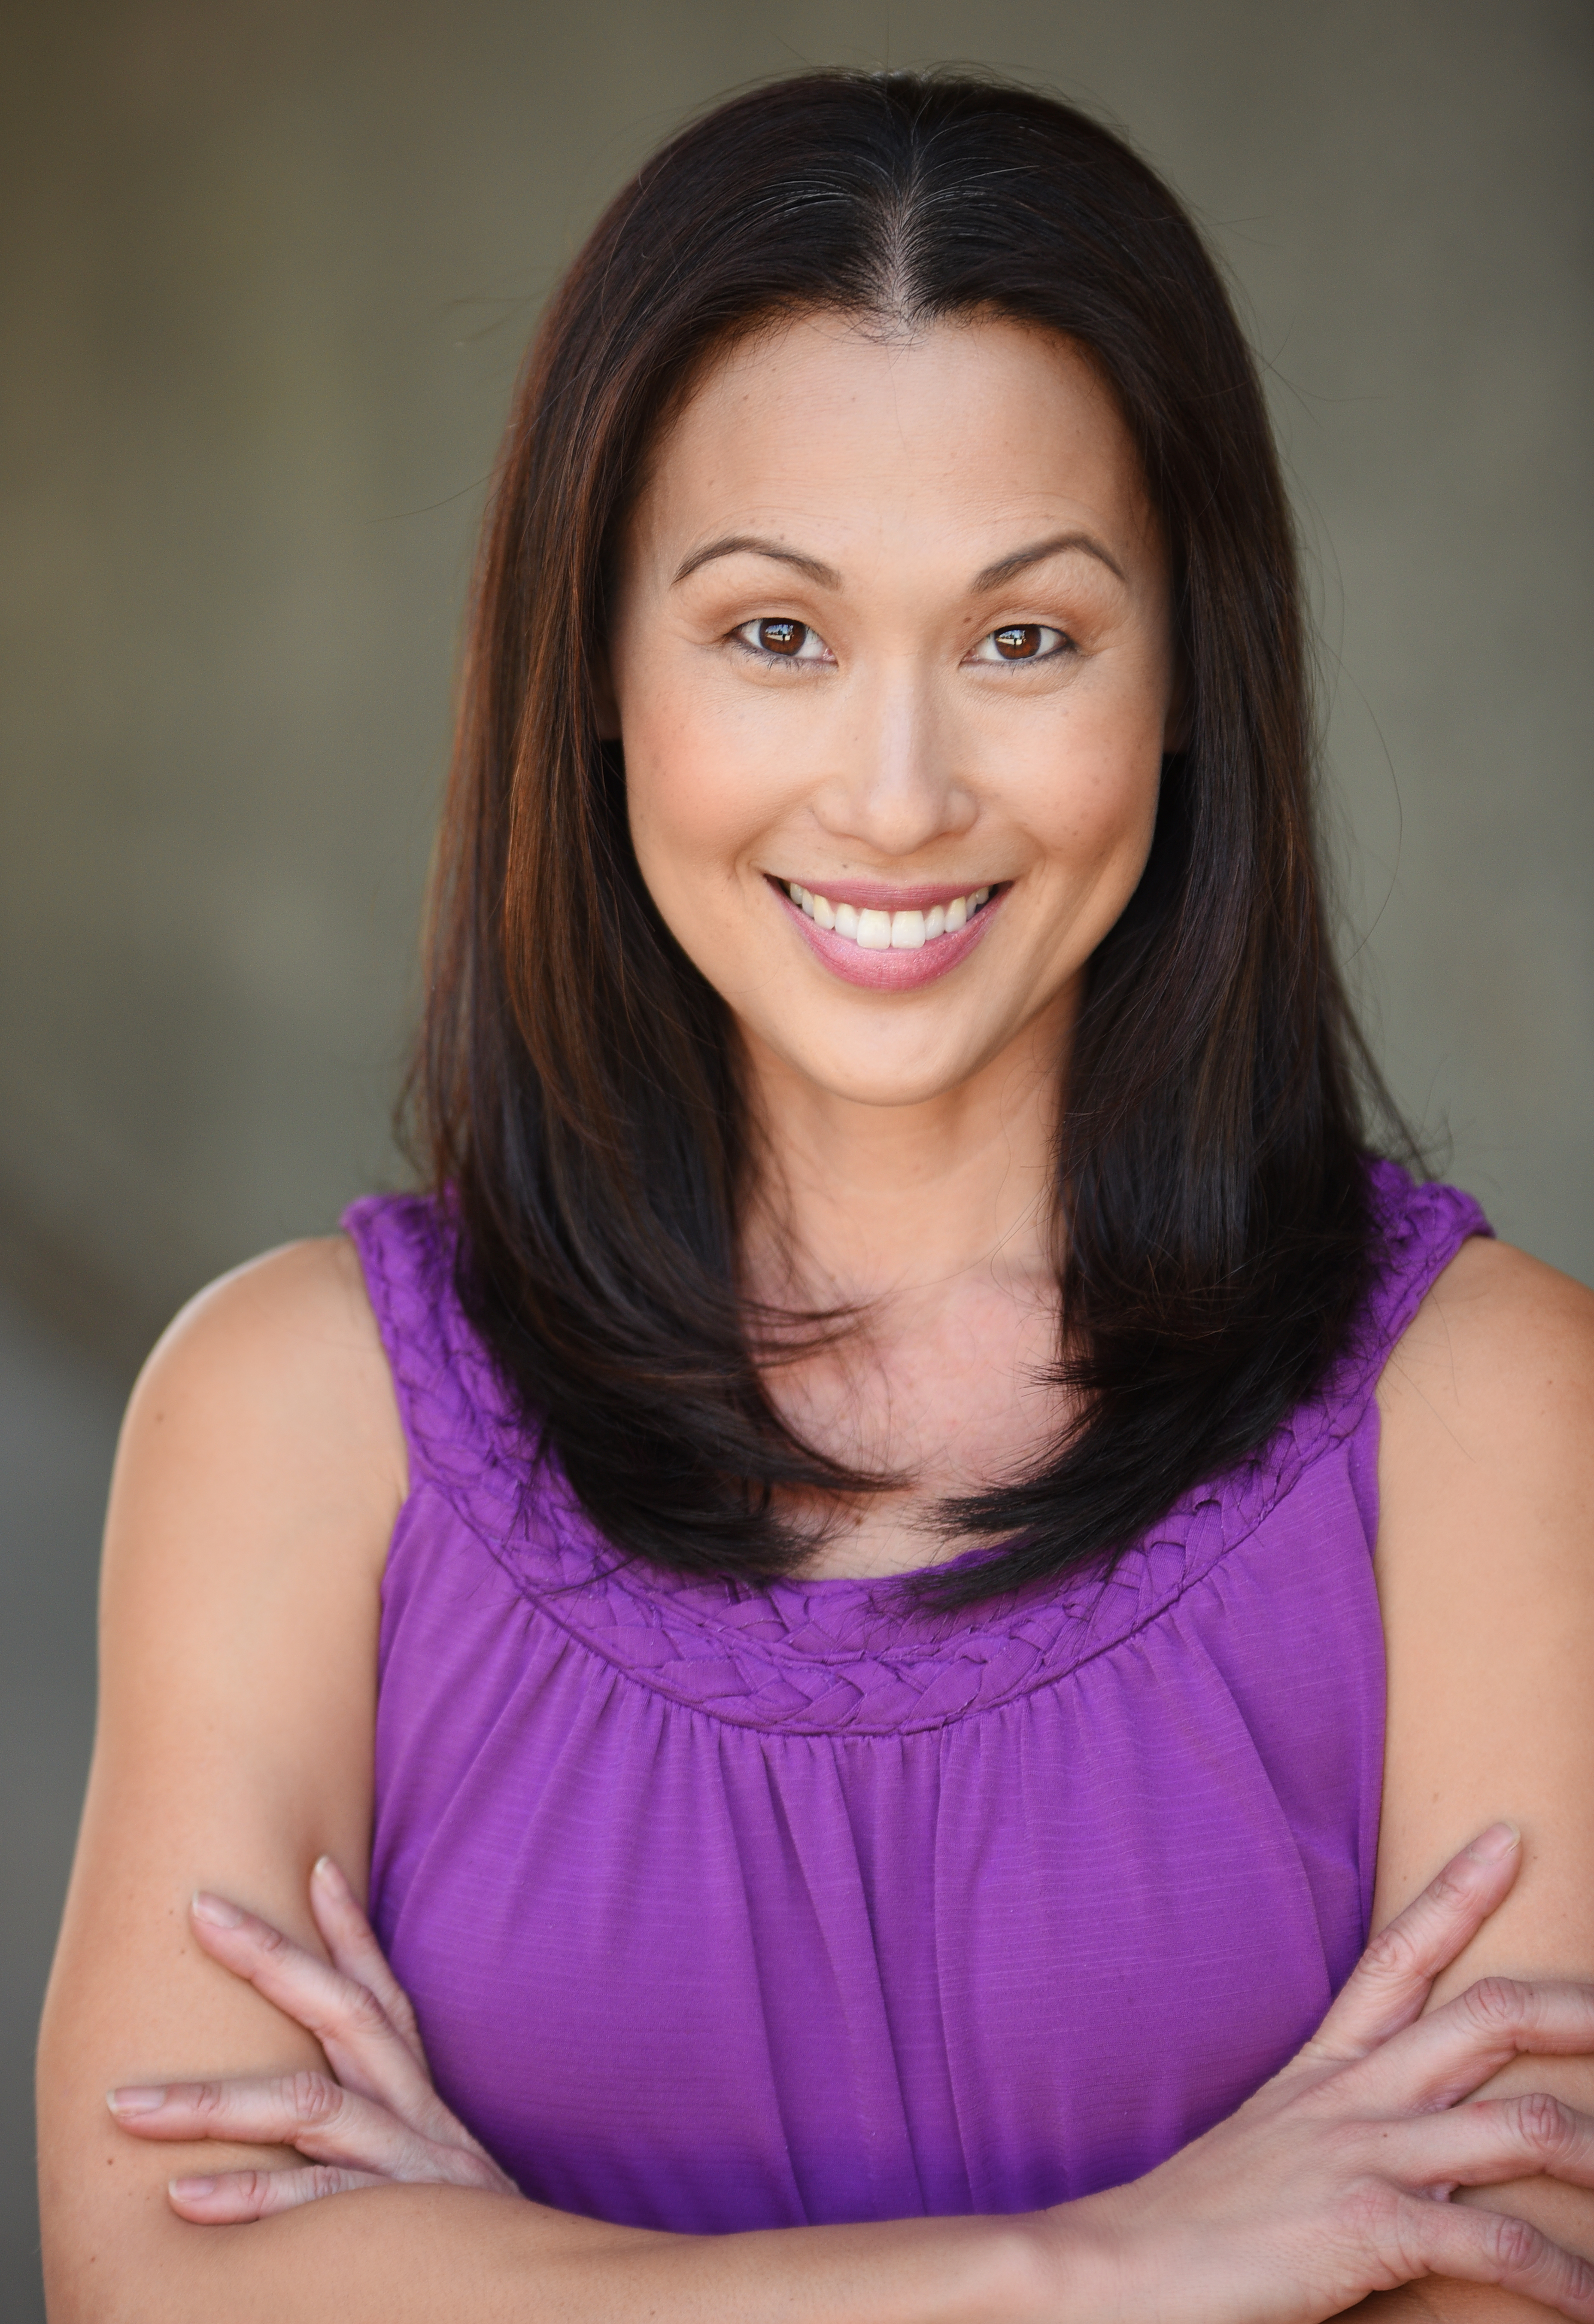 Female Asian Headshots